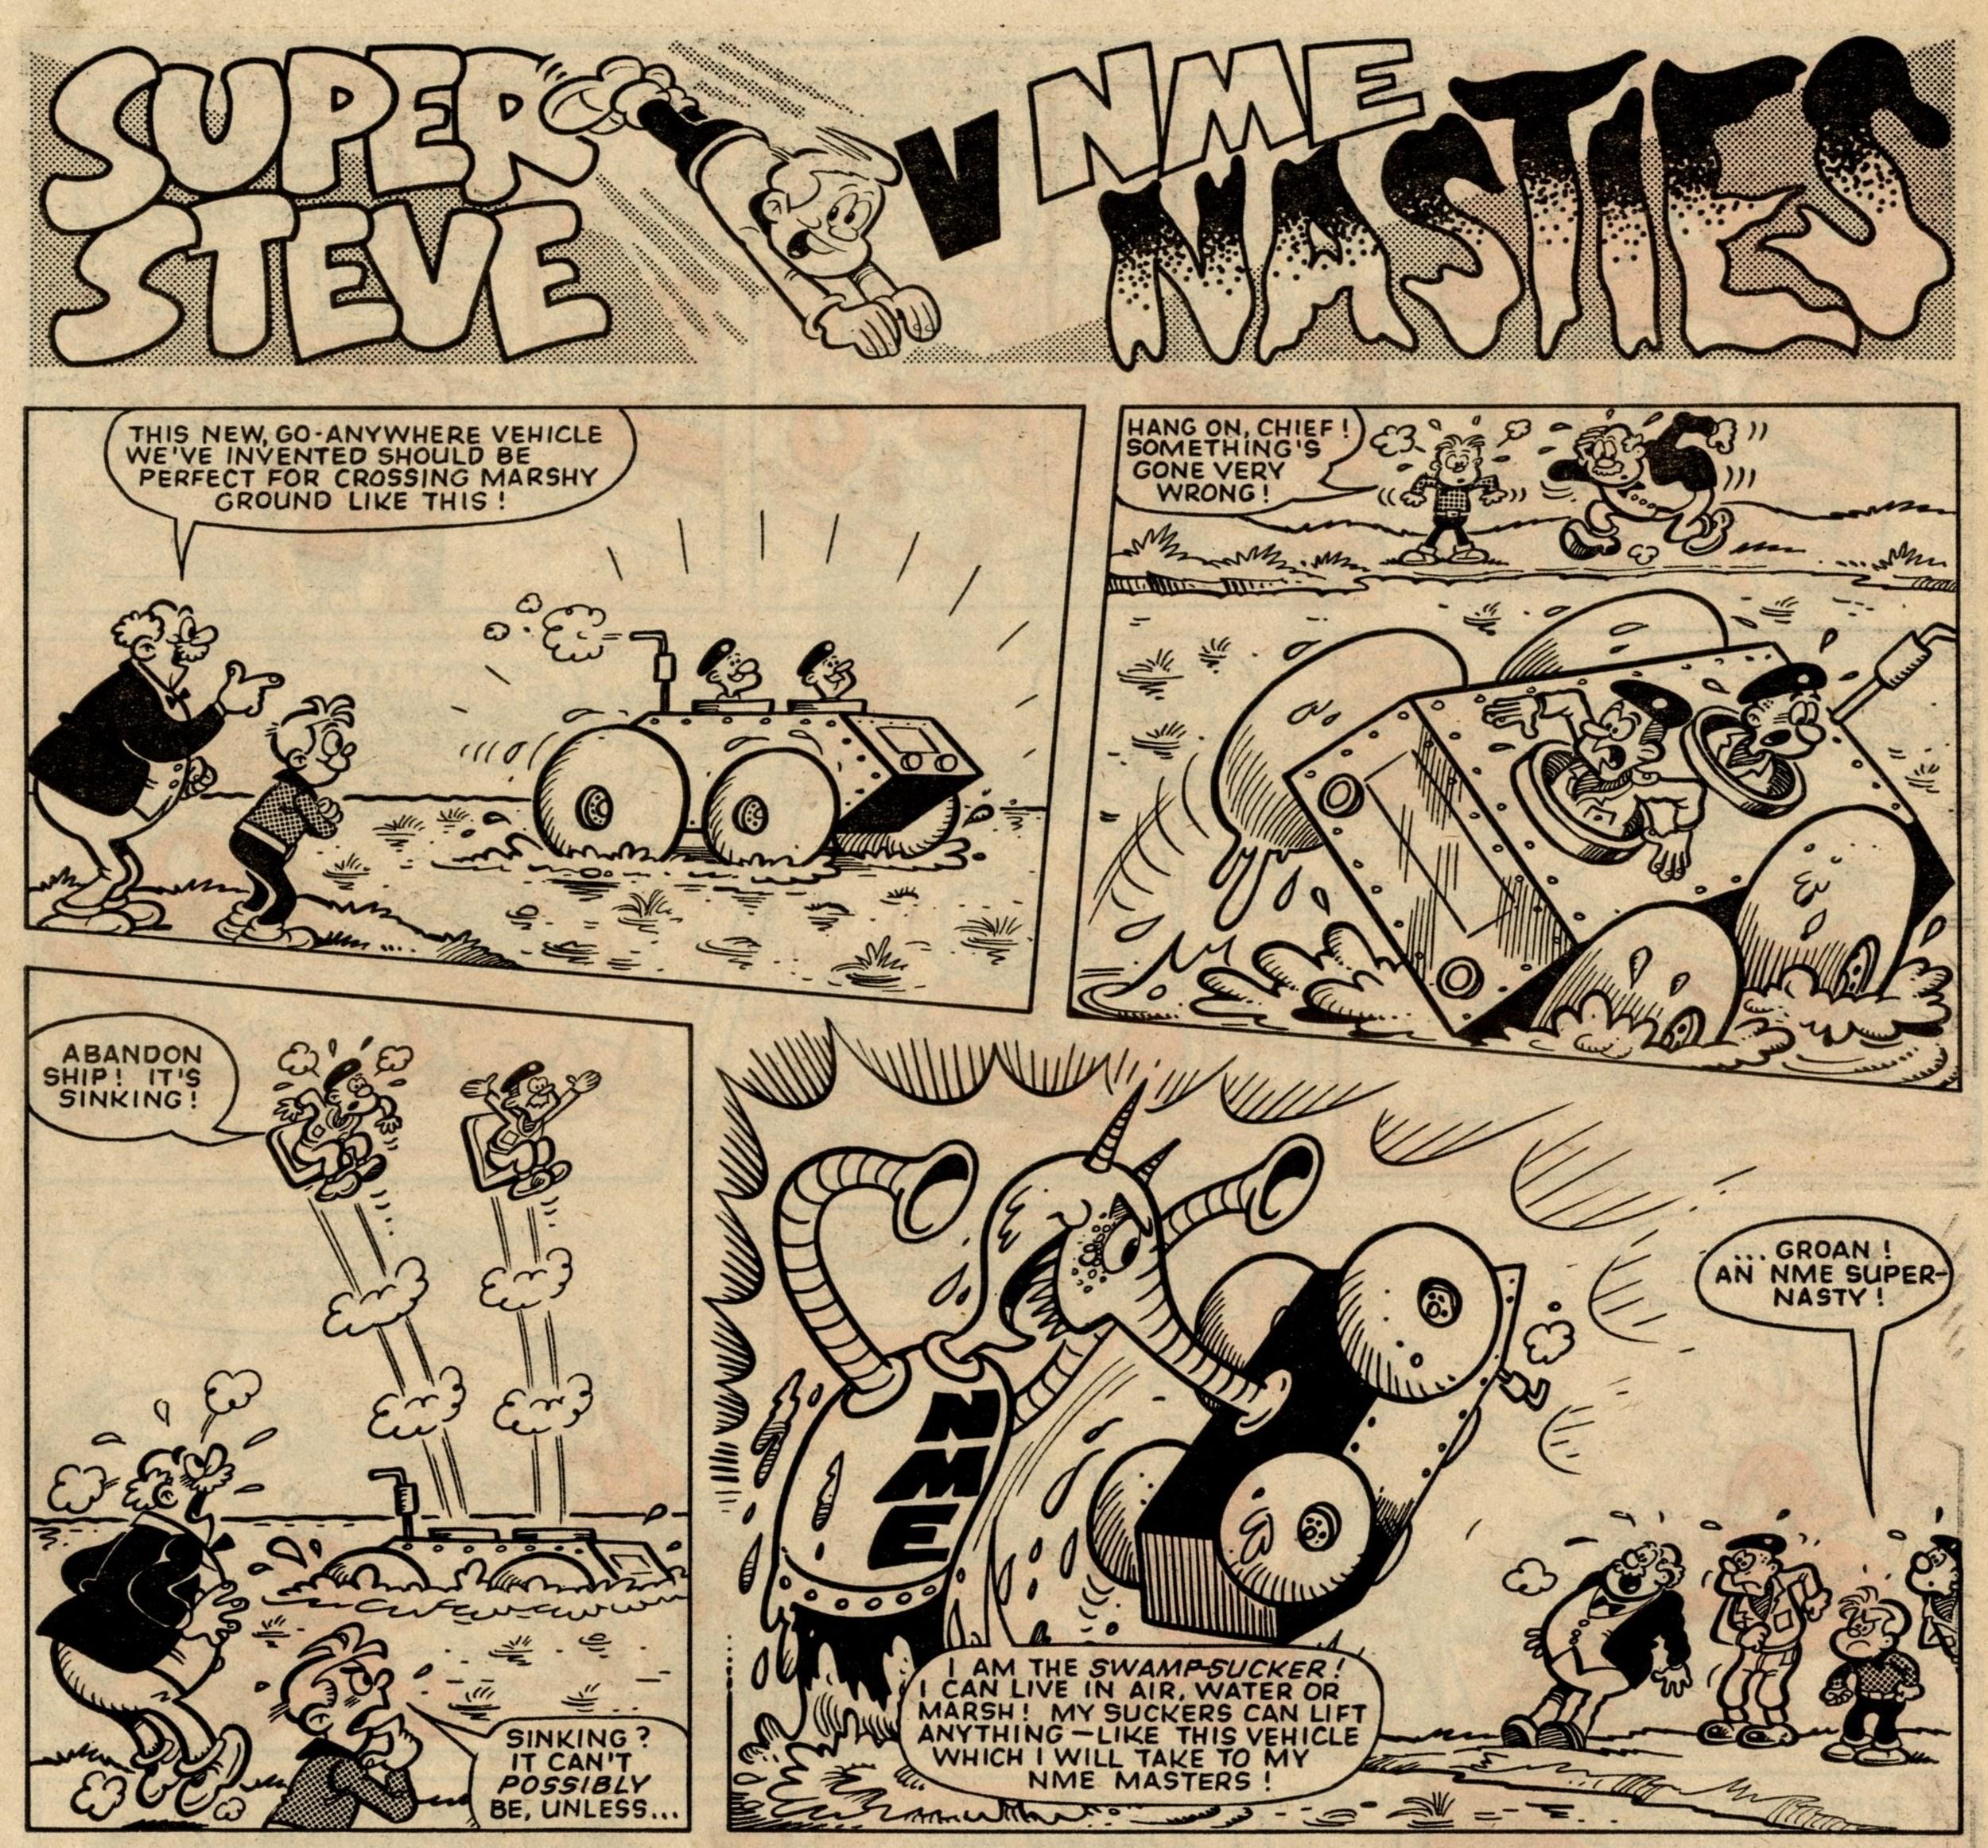 Super Steve v NME Nasties: Robert Nixon (artist)